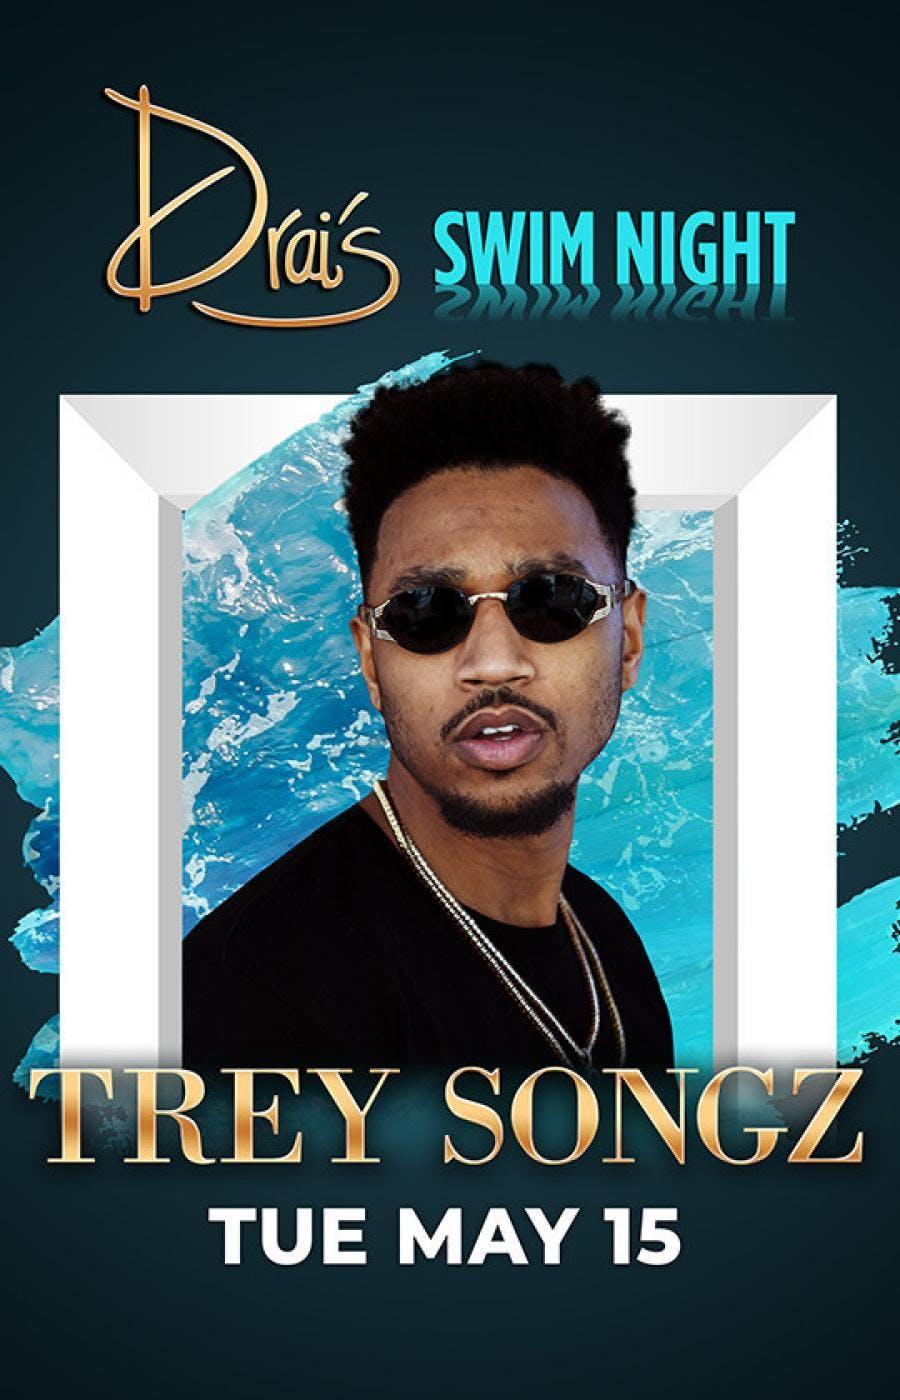 Trey Songz Live Drais Nightclub Guest List June 23 23 Jun 2018